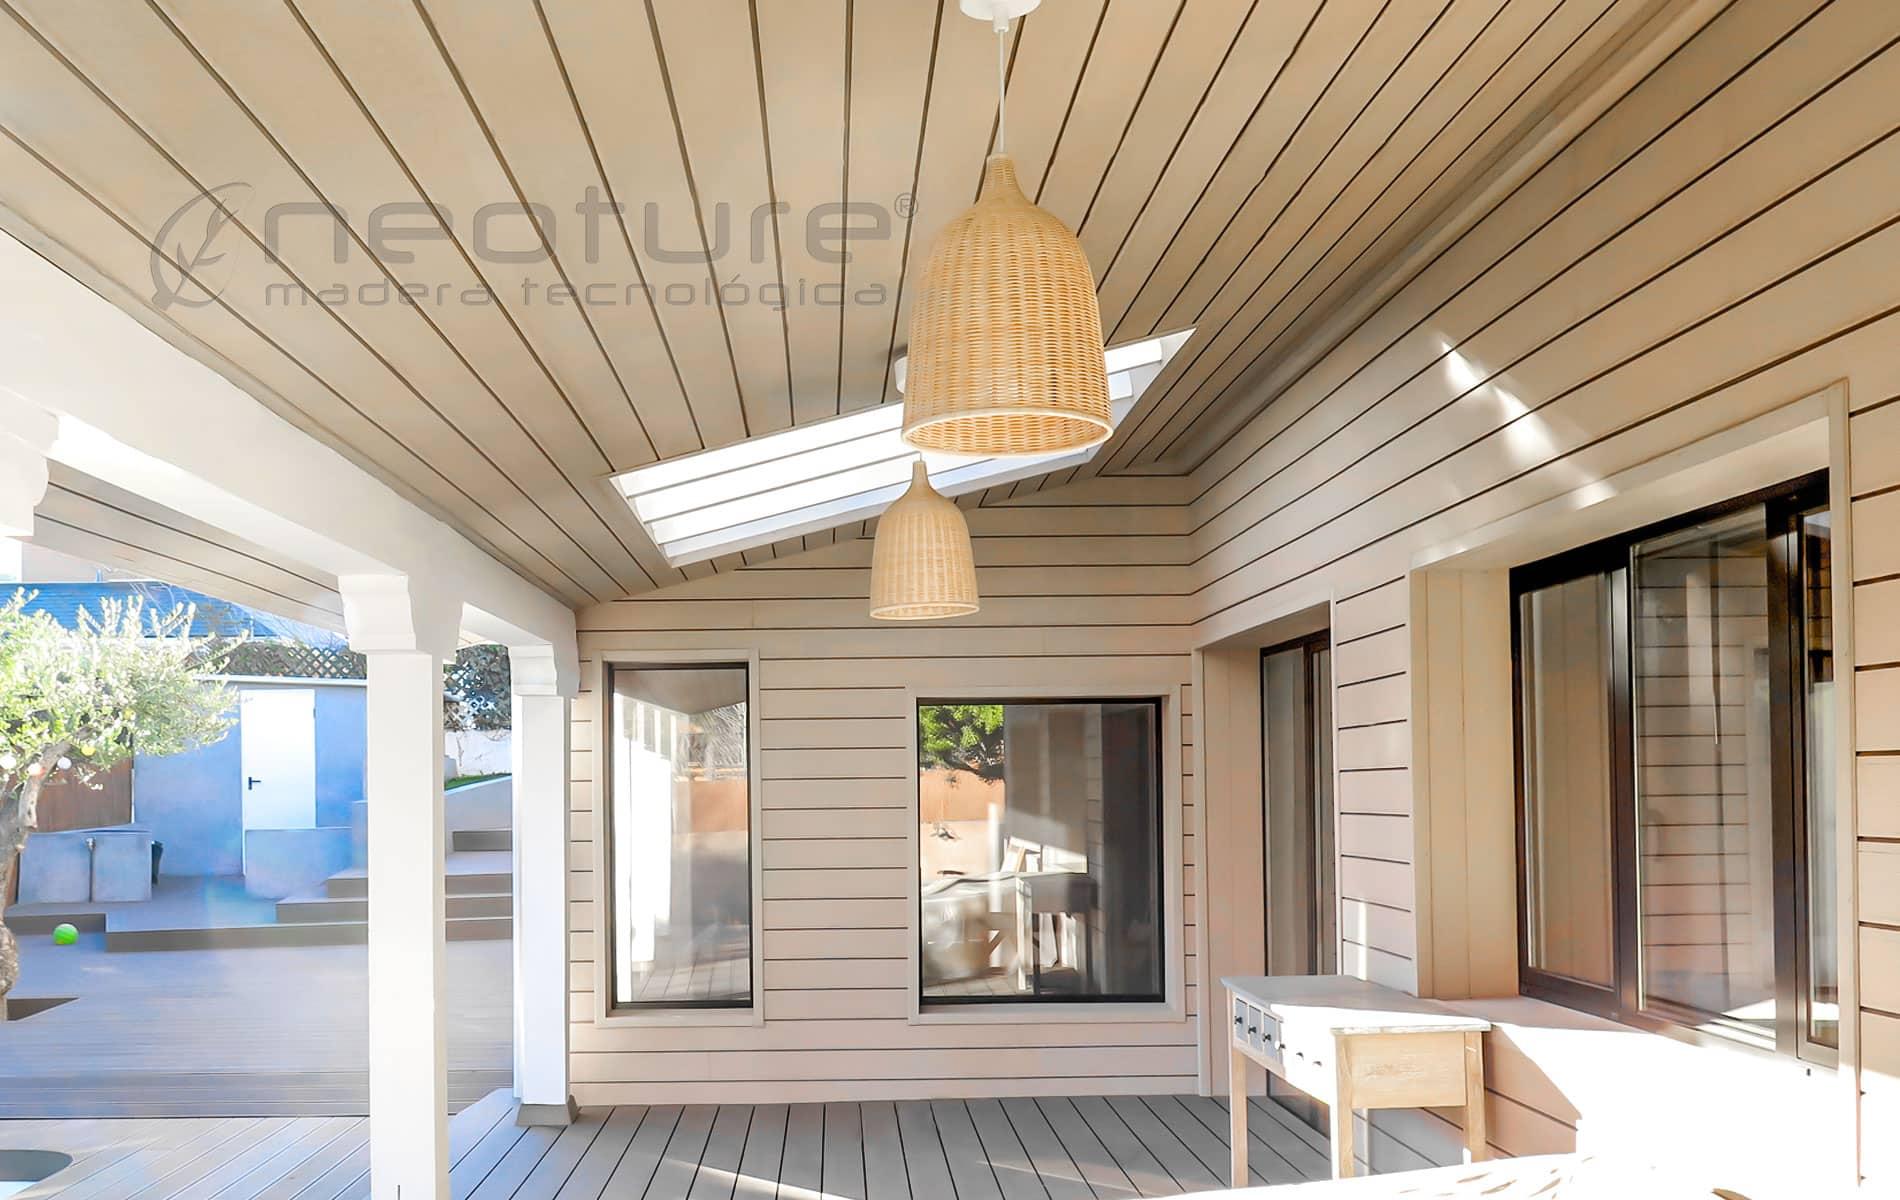 techos-de-madera-tecnológica-exterior